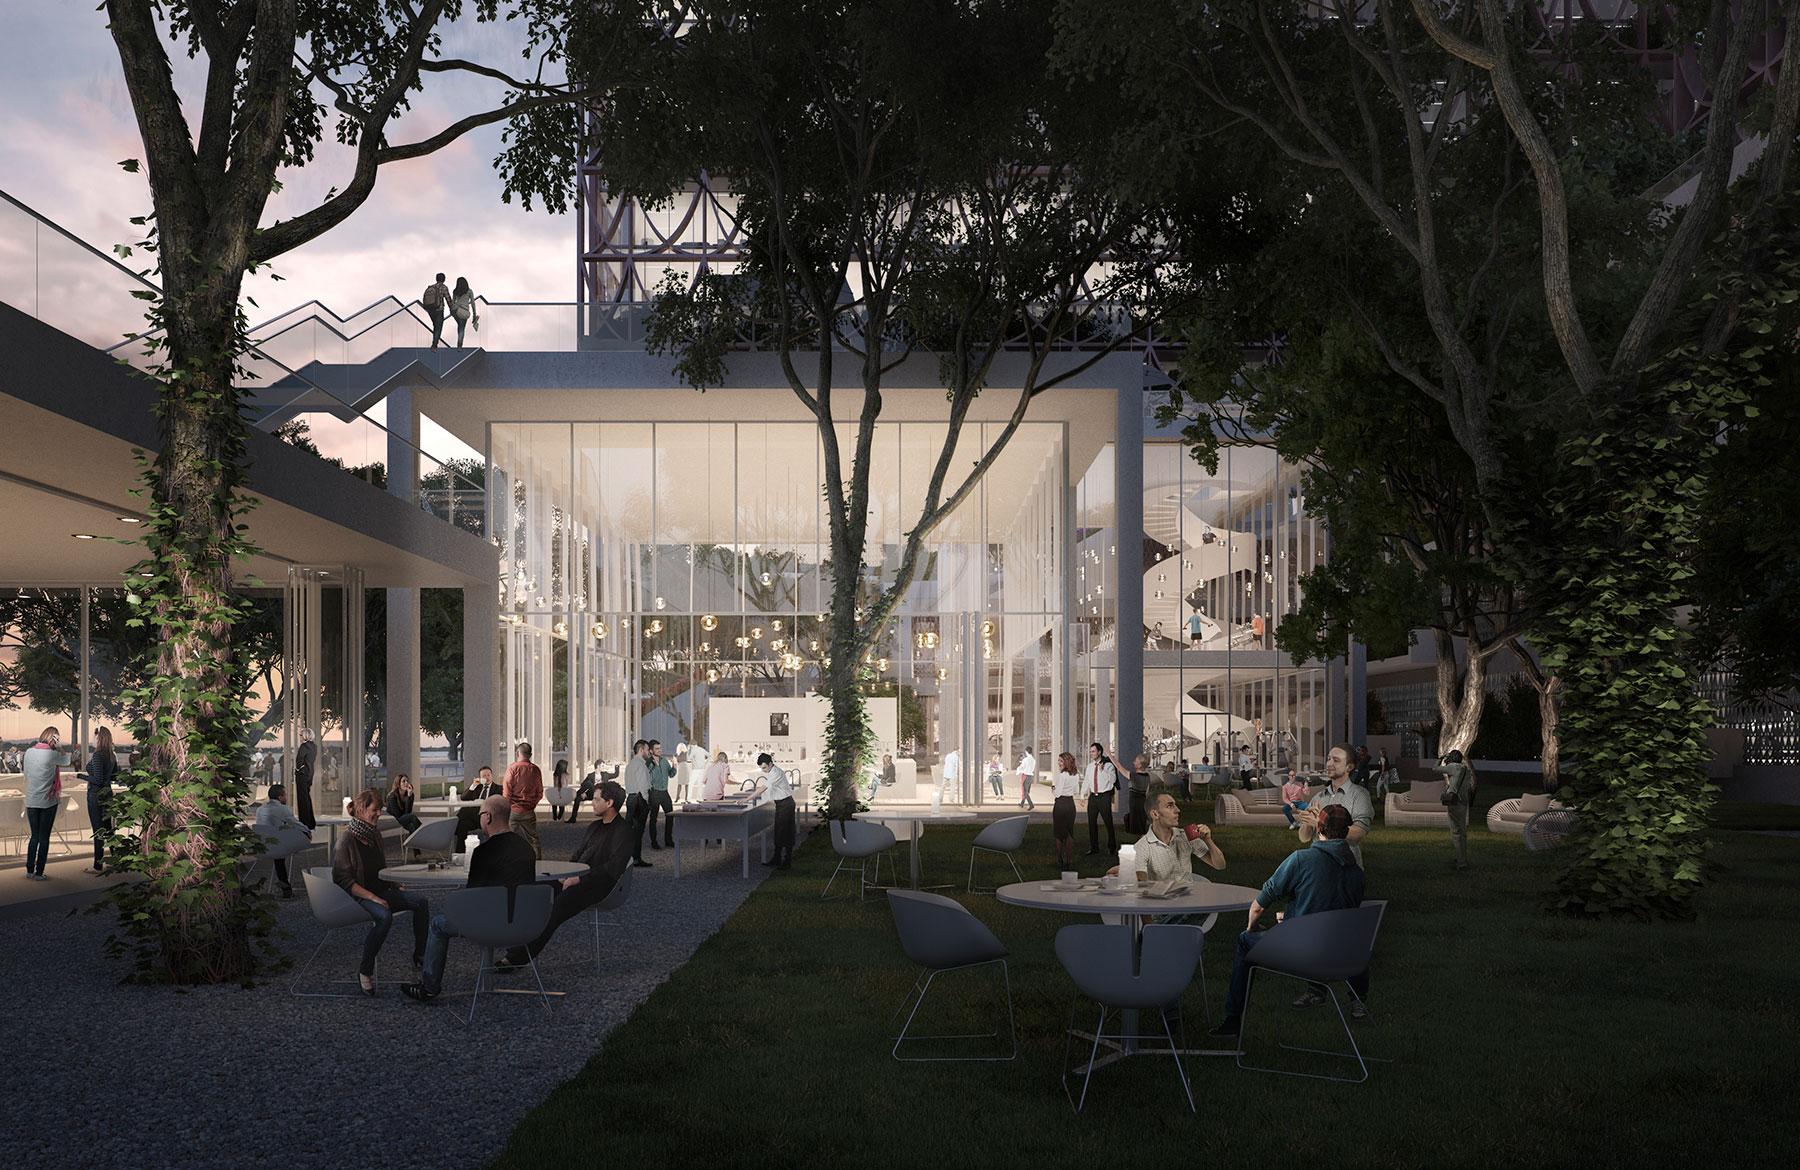 3D exterior architecture rendering images